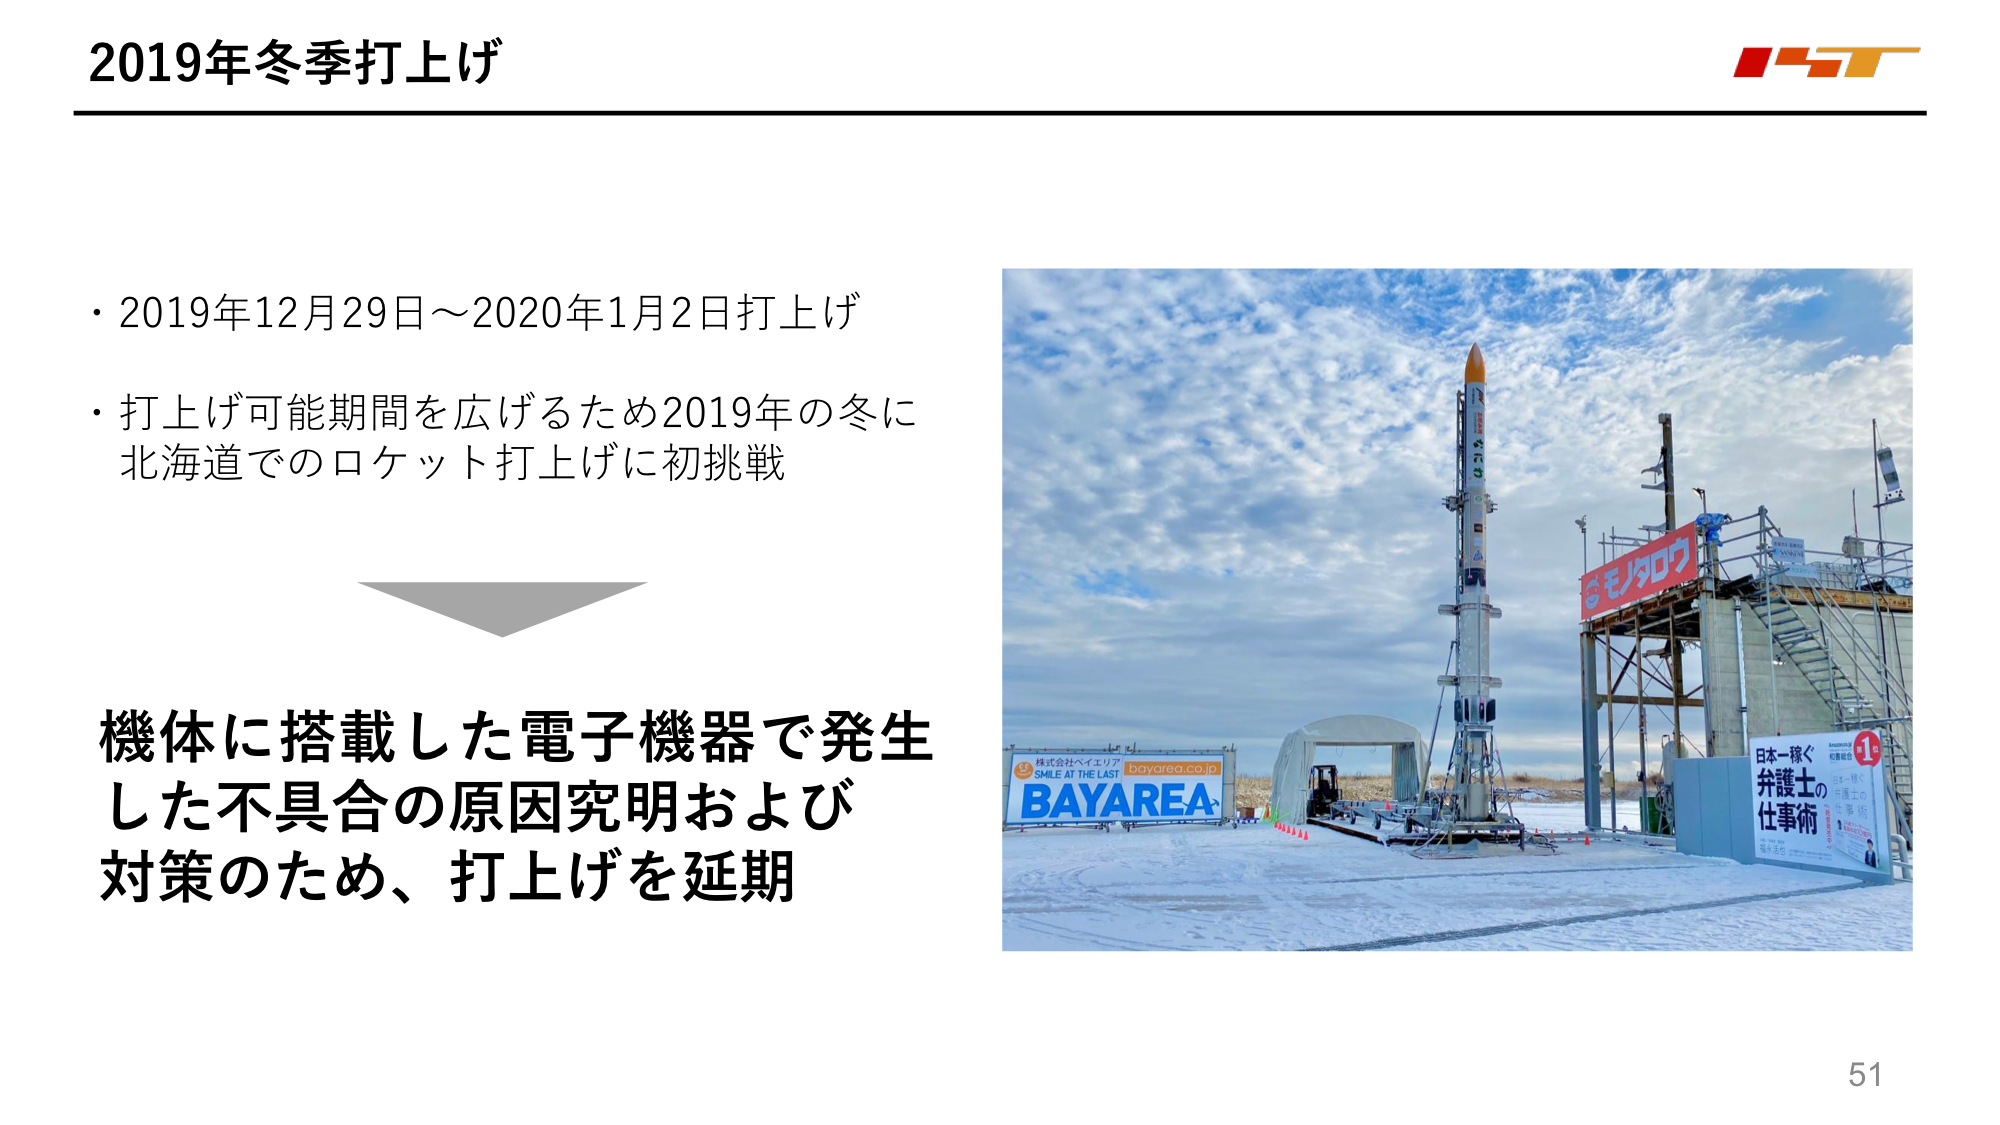 f:id:Imamura:20200603233248p:plain